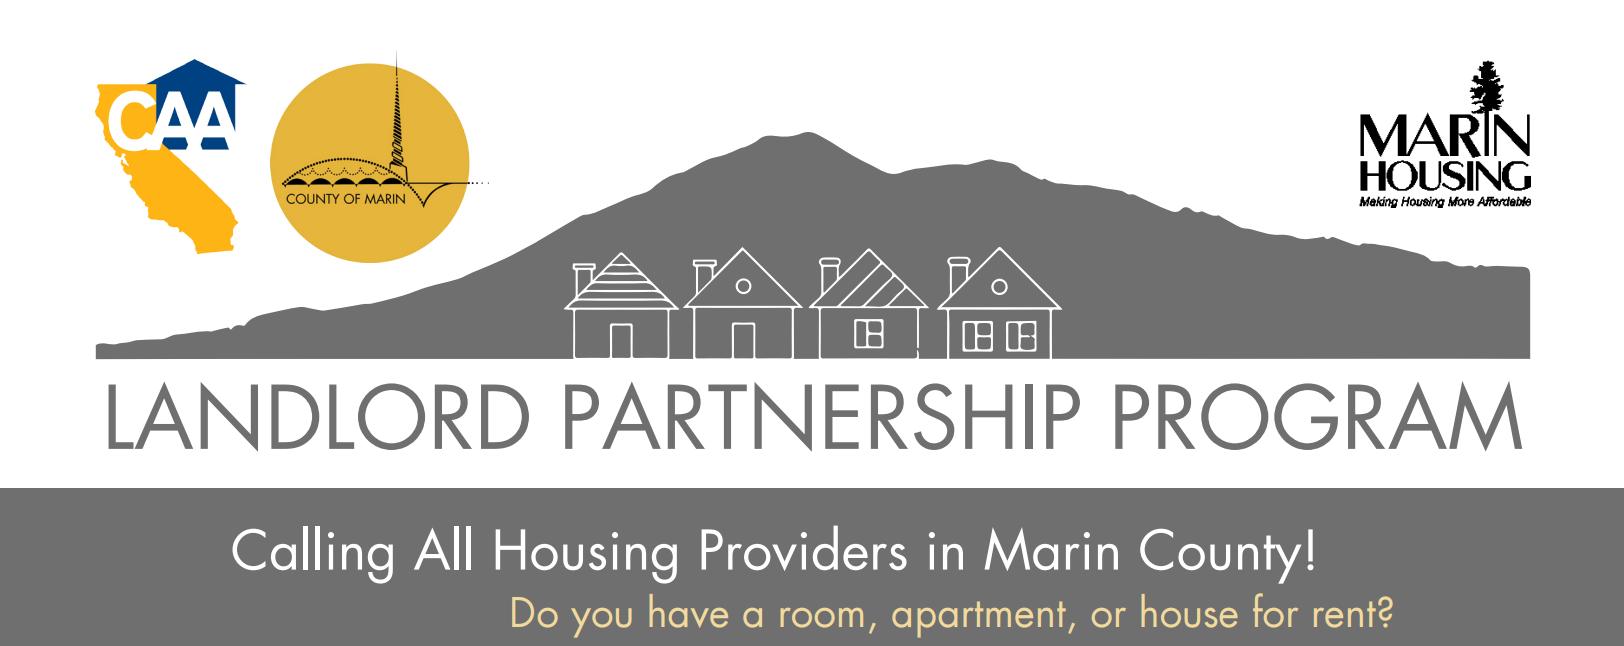 Landlord Partnership Program